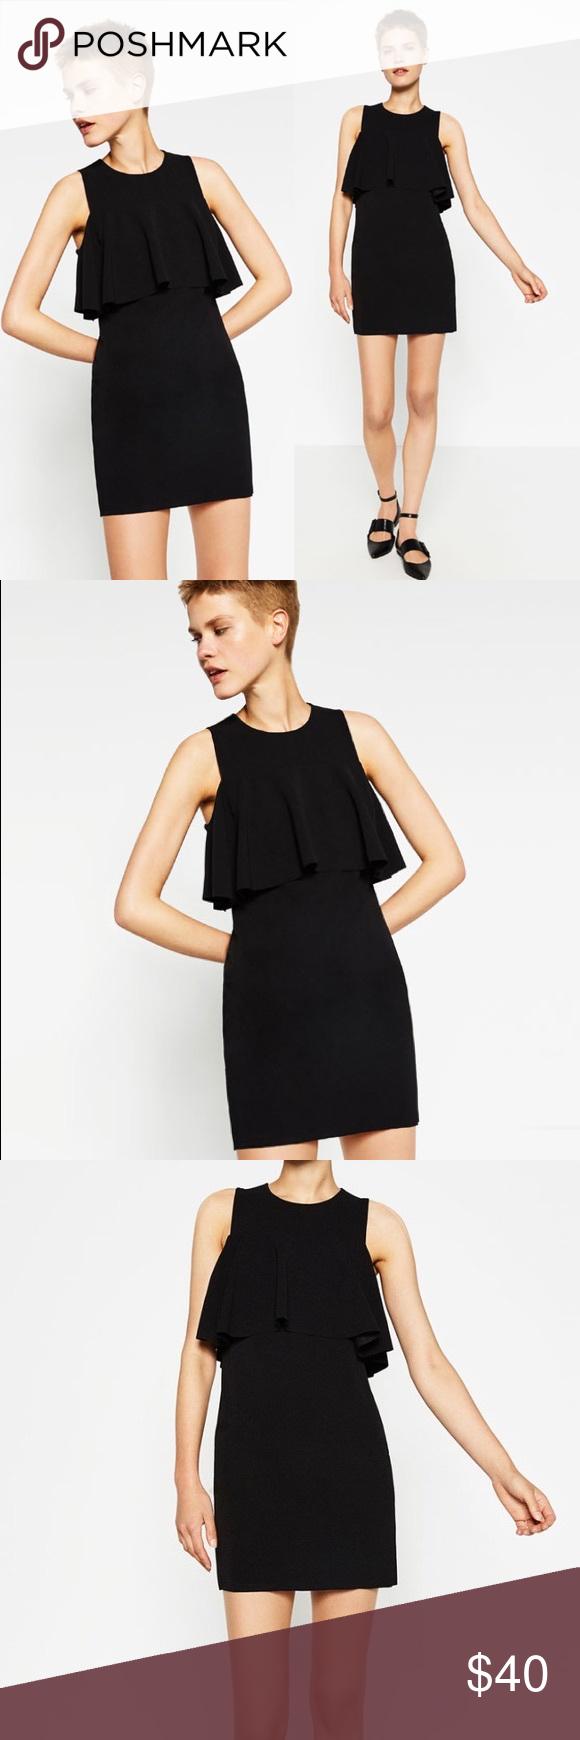 Zara Sleeveless Black Dress With Top Frill Black Sleeveless Dress Sleeveless Mini Dress Dresses [ 1740 x 580 Pixel ]